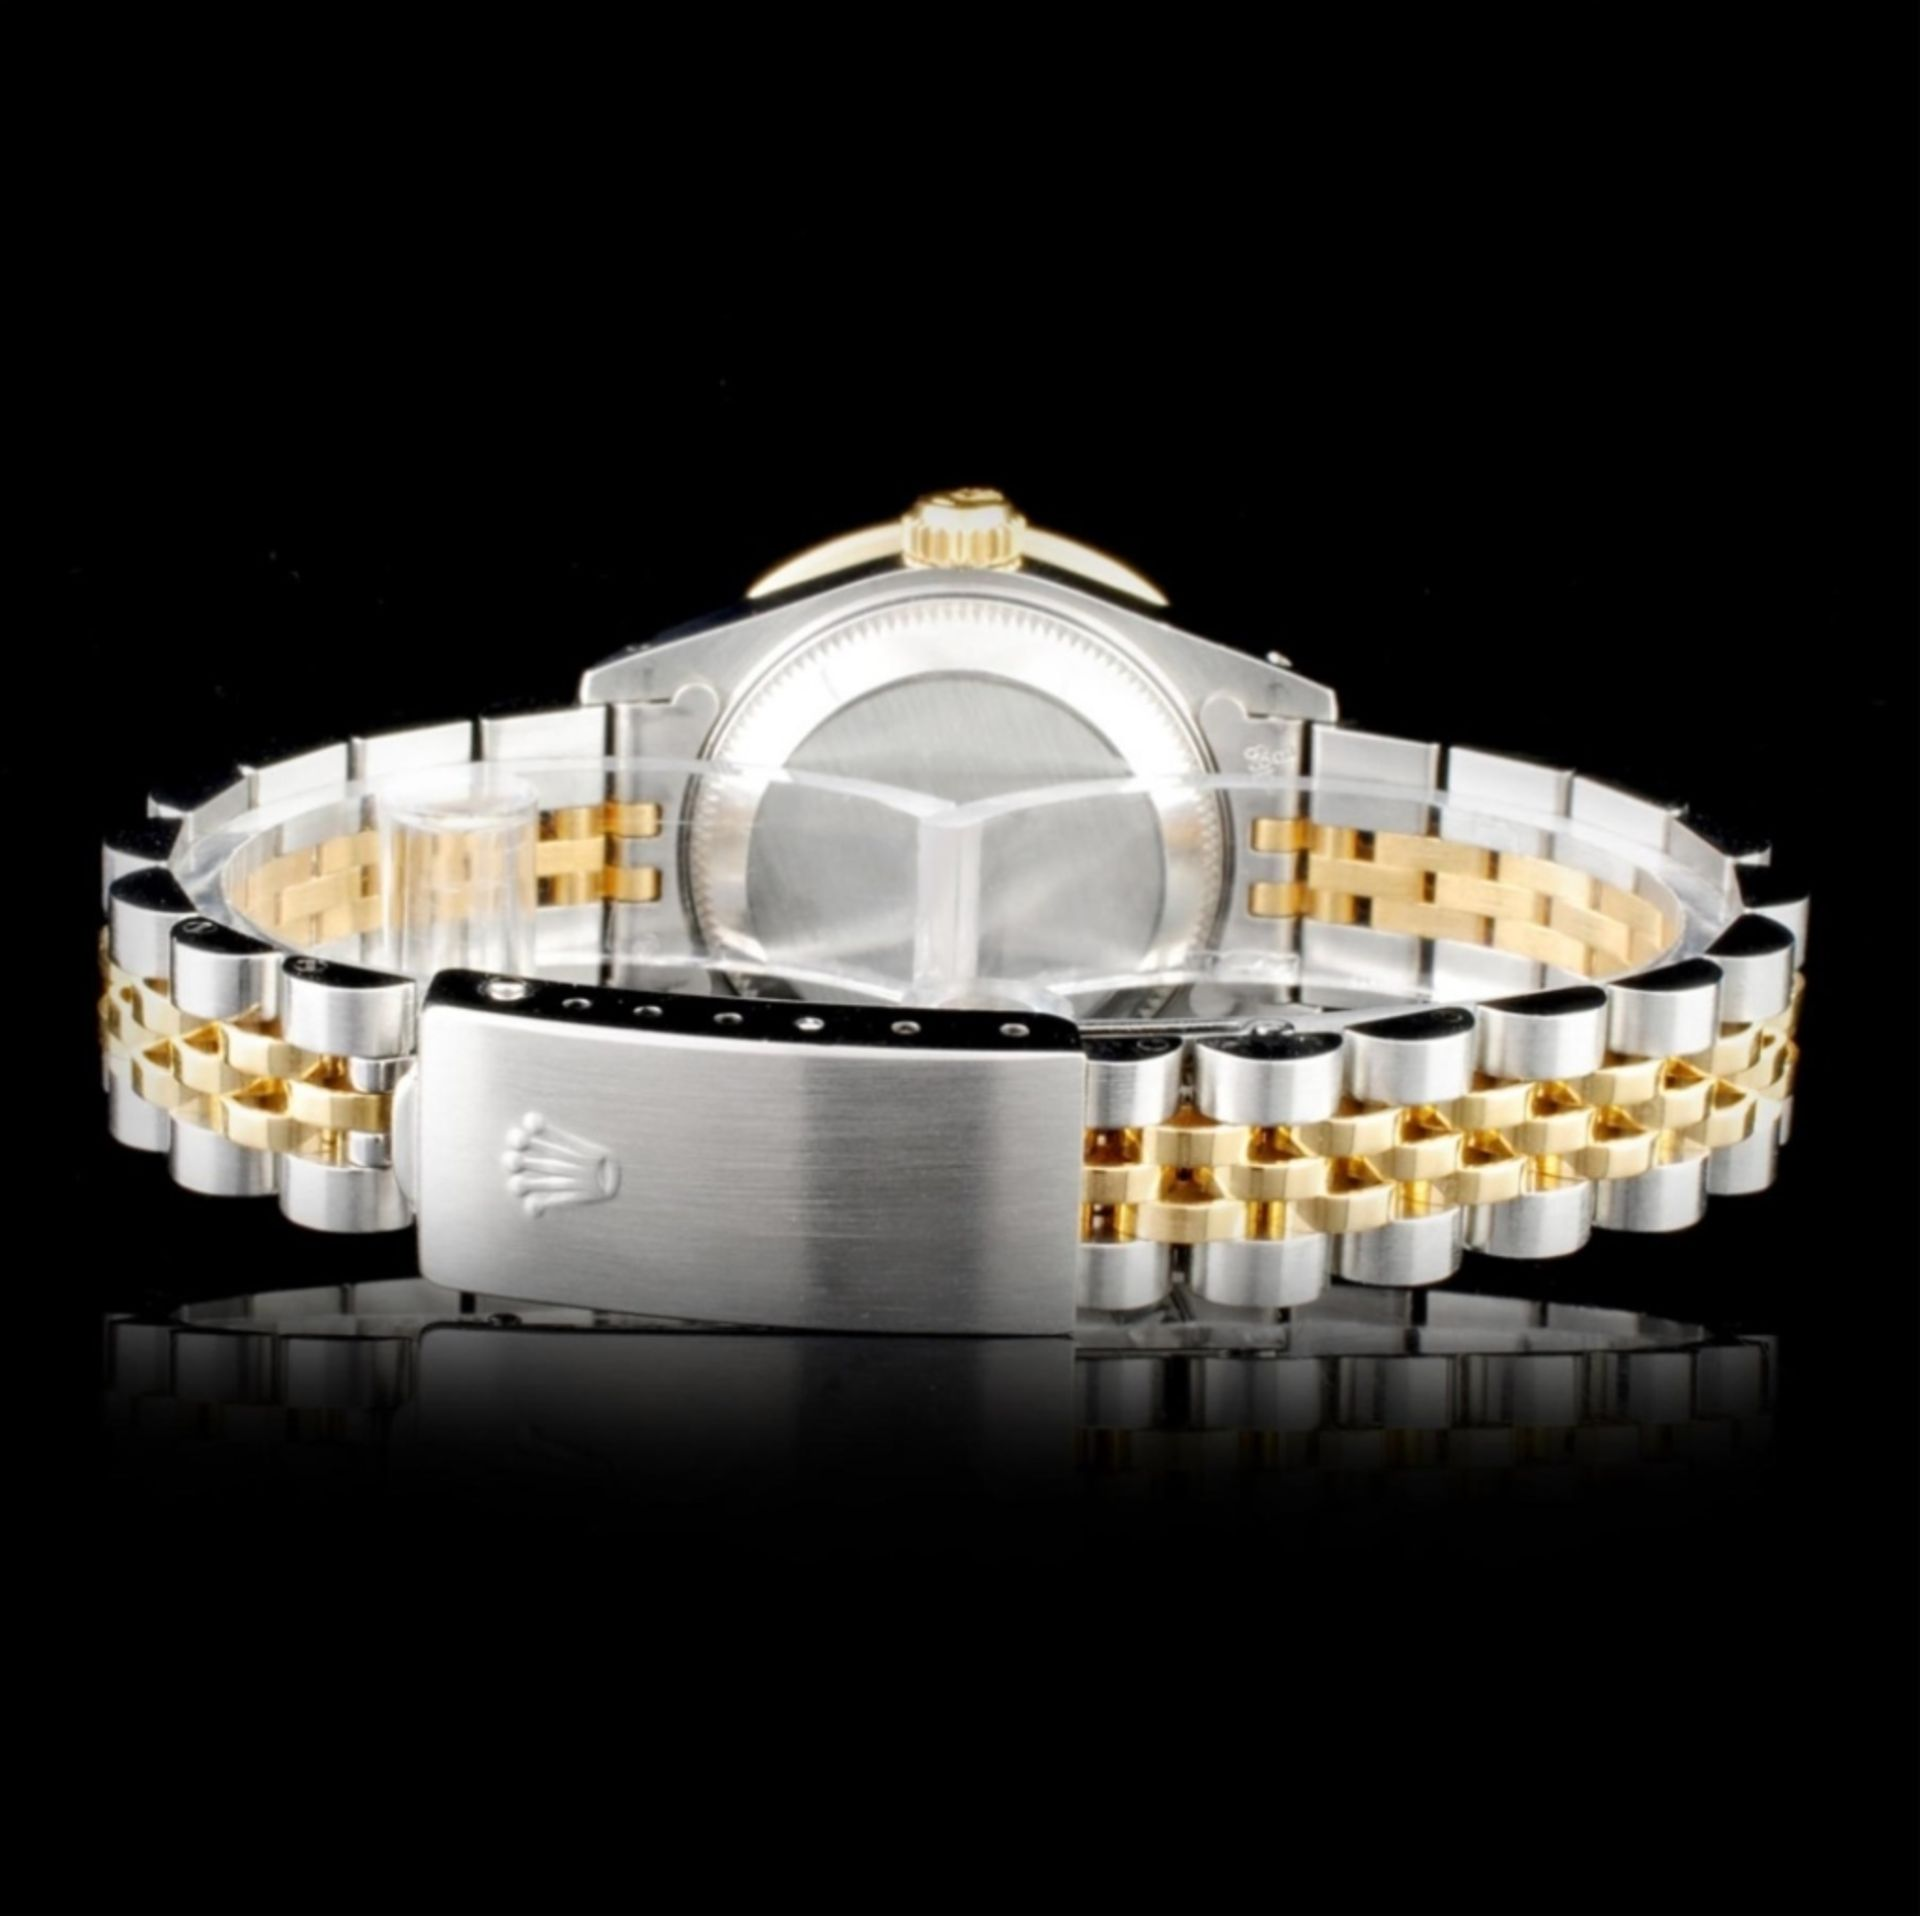 Rolex YG/SS DateJust 1.00ct Diamond Ladies Wristwa - Image 3 of 5